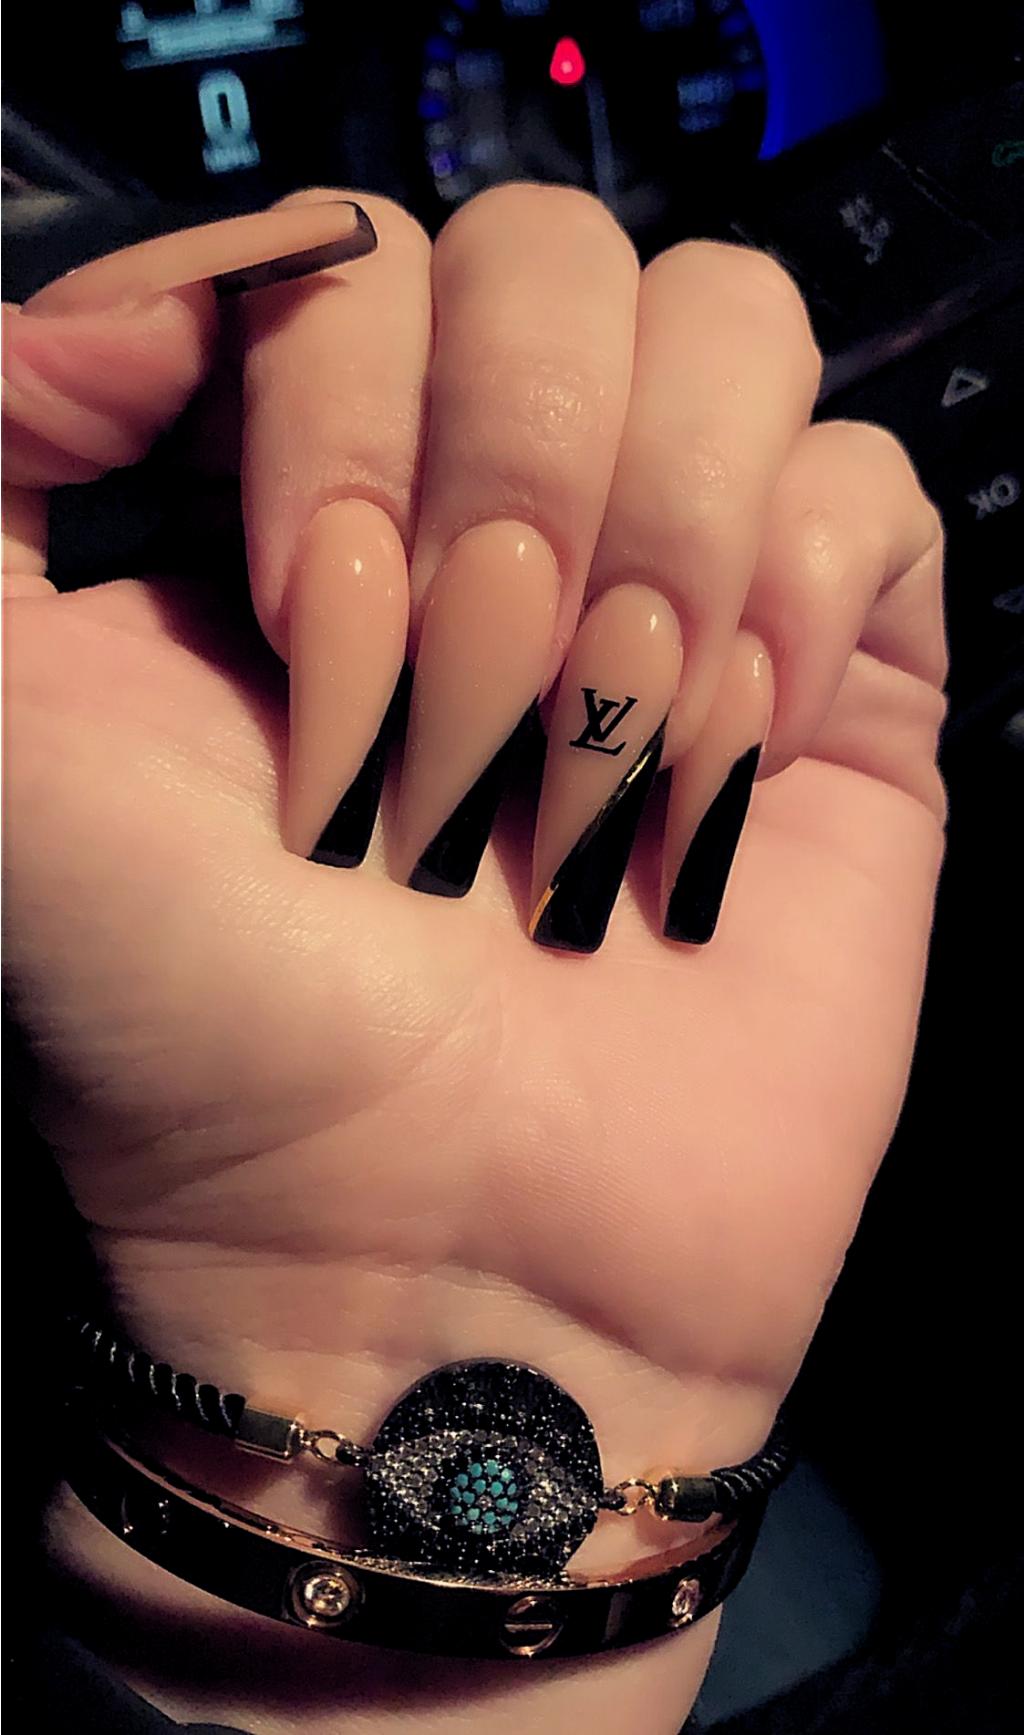 ᴘɪɴᴛᴇʀᴇsᴛ : @Dʀ3ᴀᴍDᴏ11   Kylie nails, Long acrylic nails